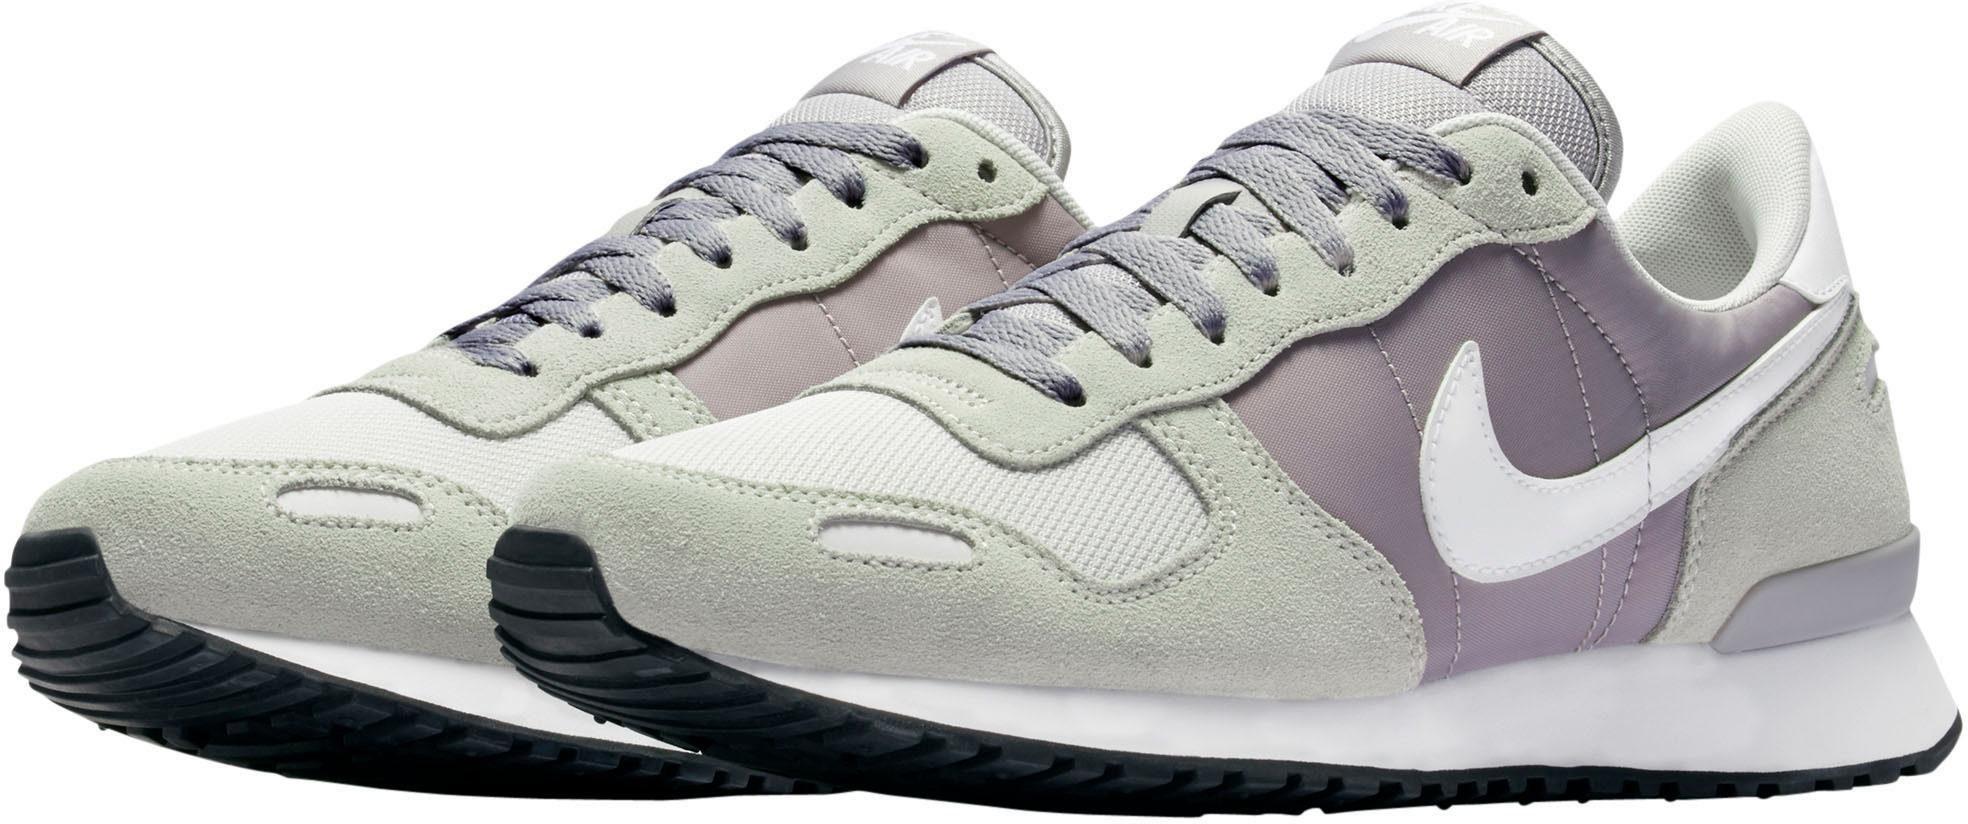 Nike Sportswear Air Max Full-Zip Hoodie Jacke Sweatjacke Gr M L UVP 90 €